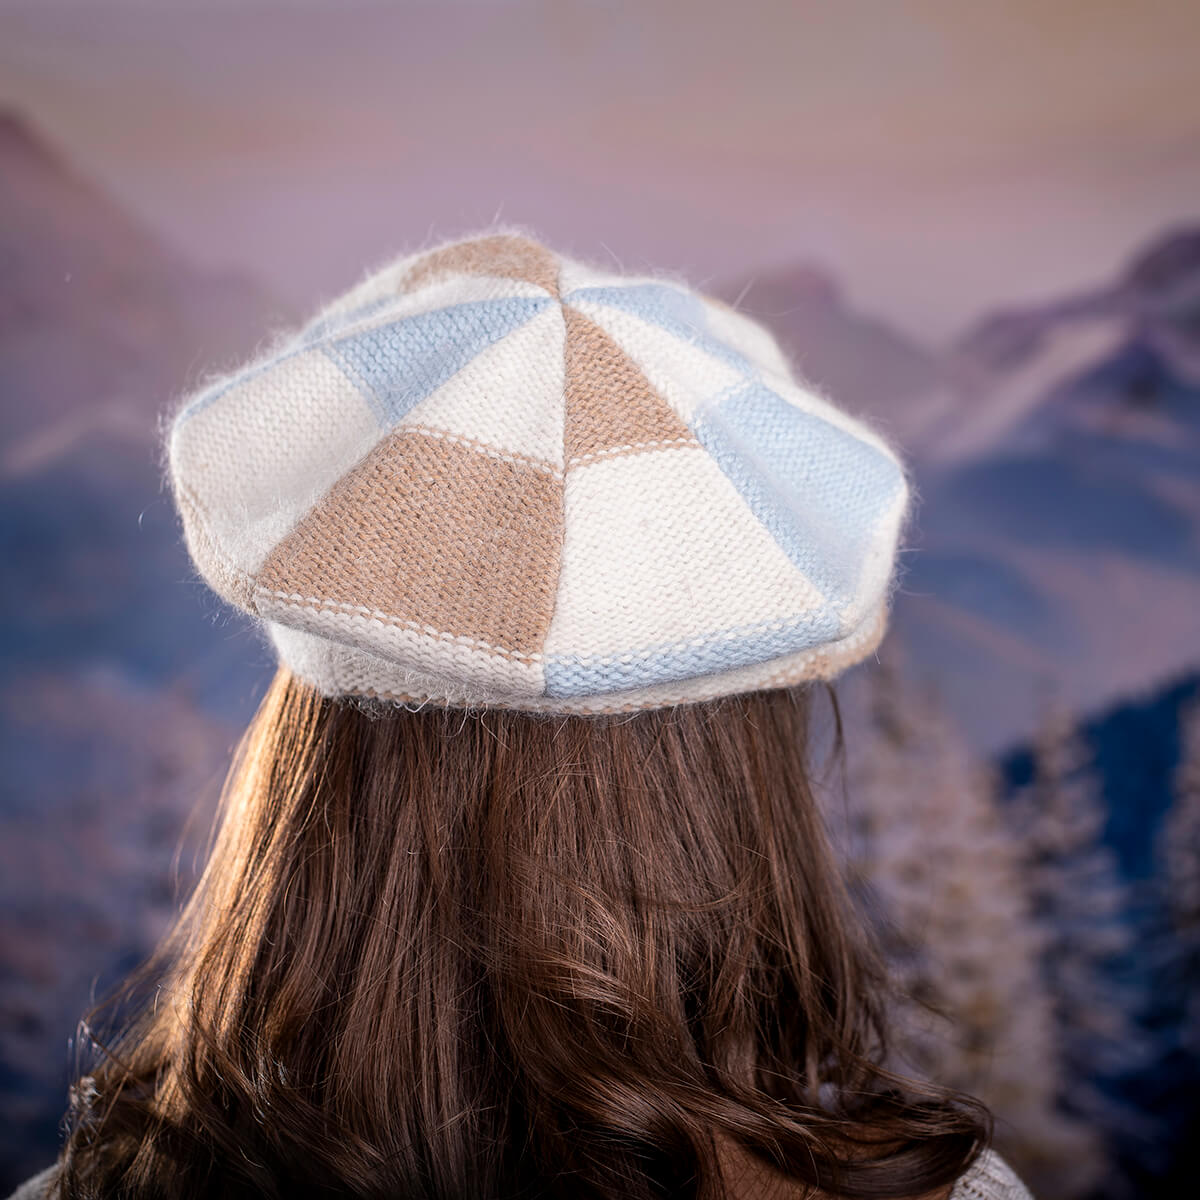 Зимна шапка Ангора в Синьо, Бяло и Бежово